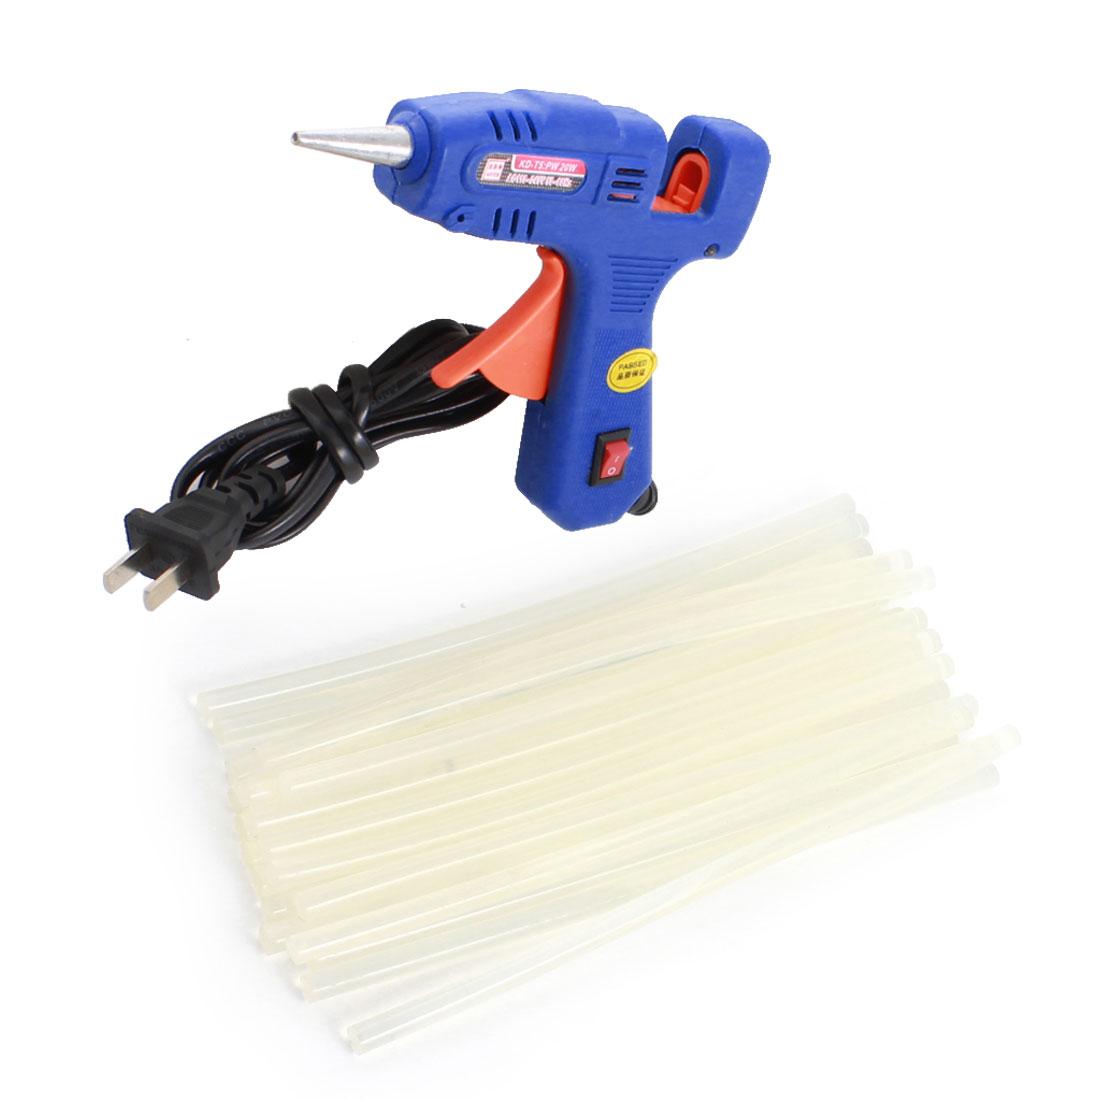 AC100V-240V US Plug Plastic Shell Arts Craft Crafting 20W Blue Glue Gun + 20Pcs 7x200mm Hot Melt Adhesive Sticks